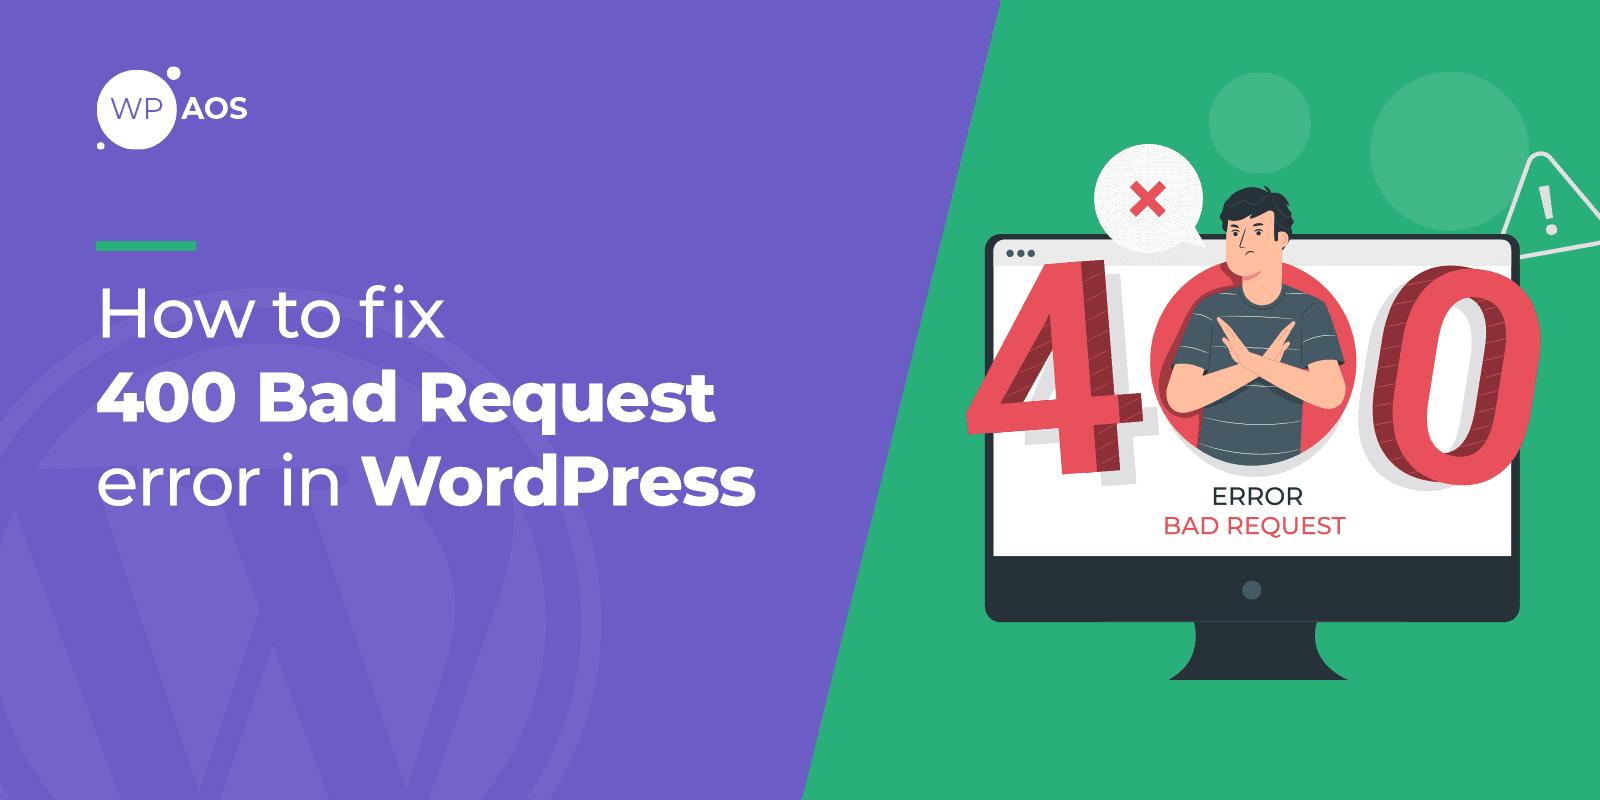 How to Fix 400 Bad Request Error, WordPress maintenance, wpaos